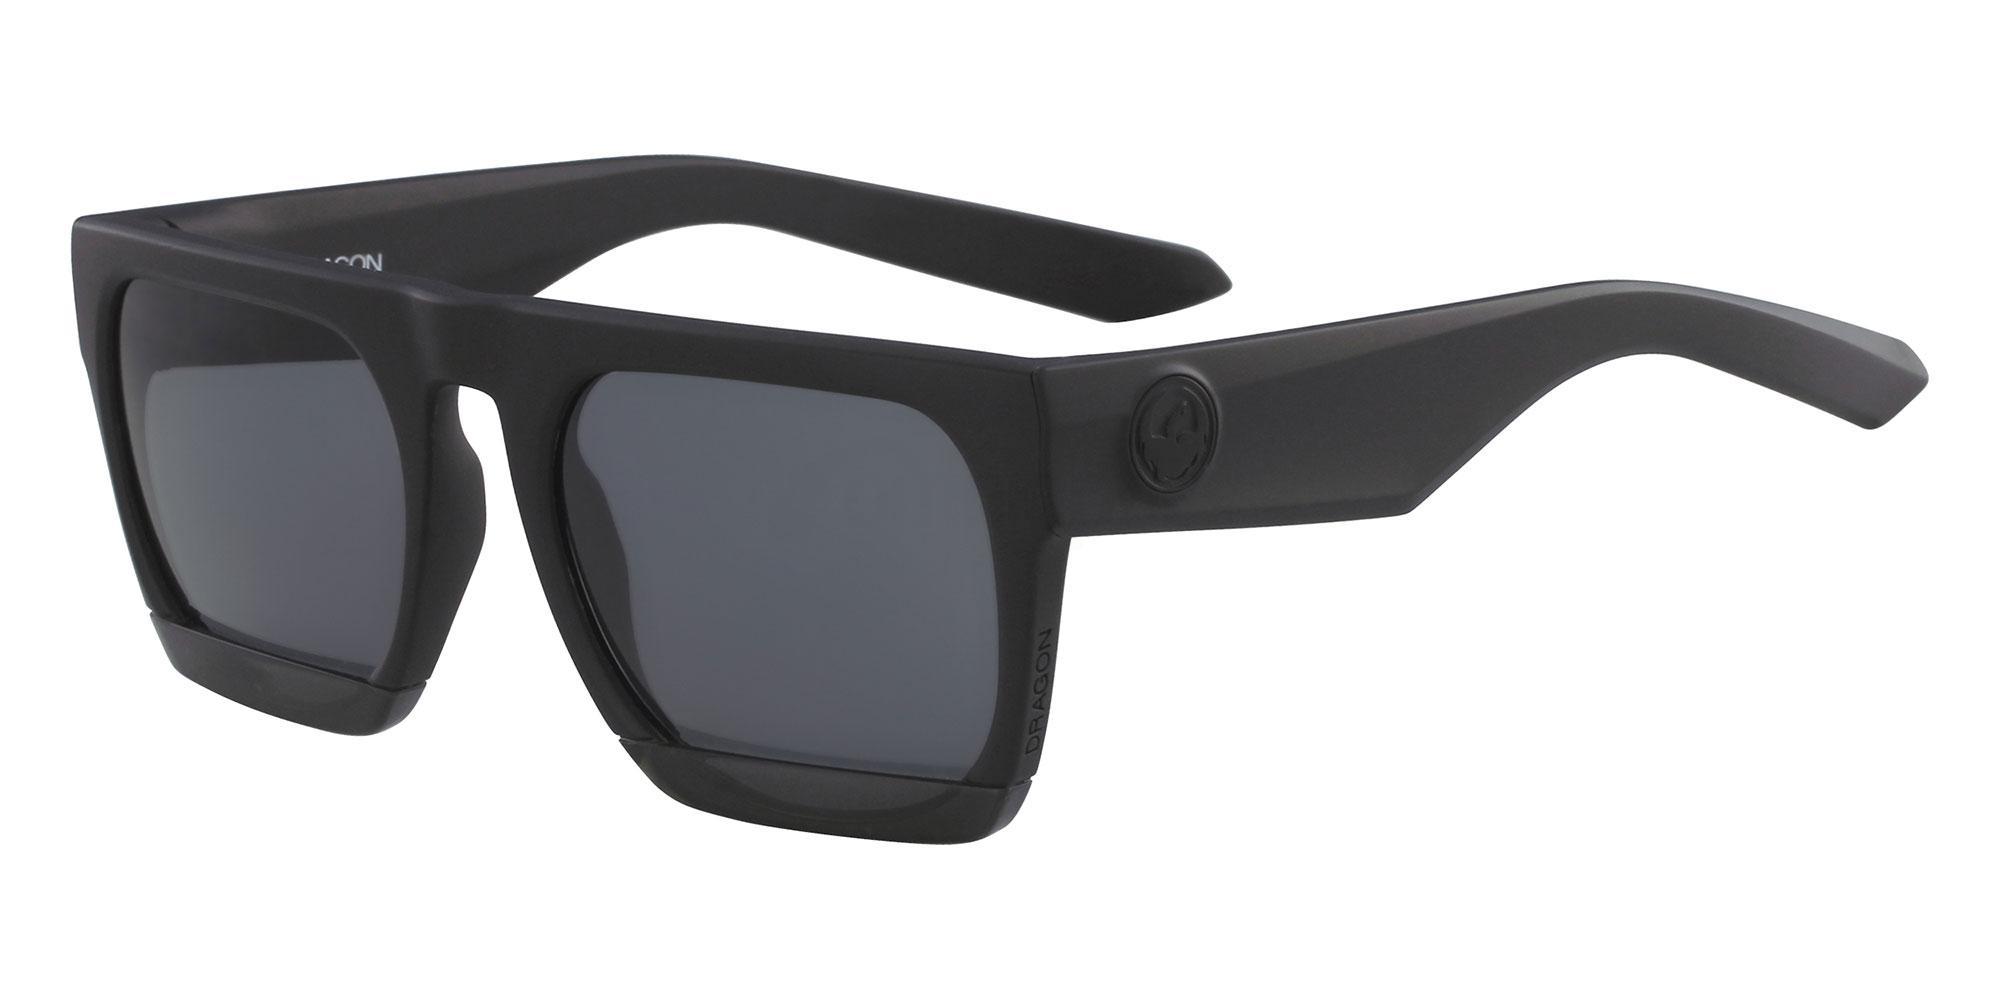 002 DR FAKIE Sunglasses, Dragon